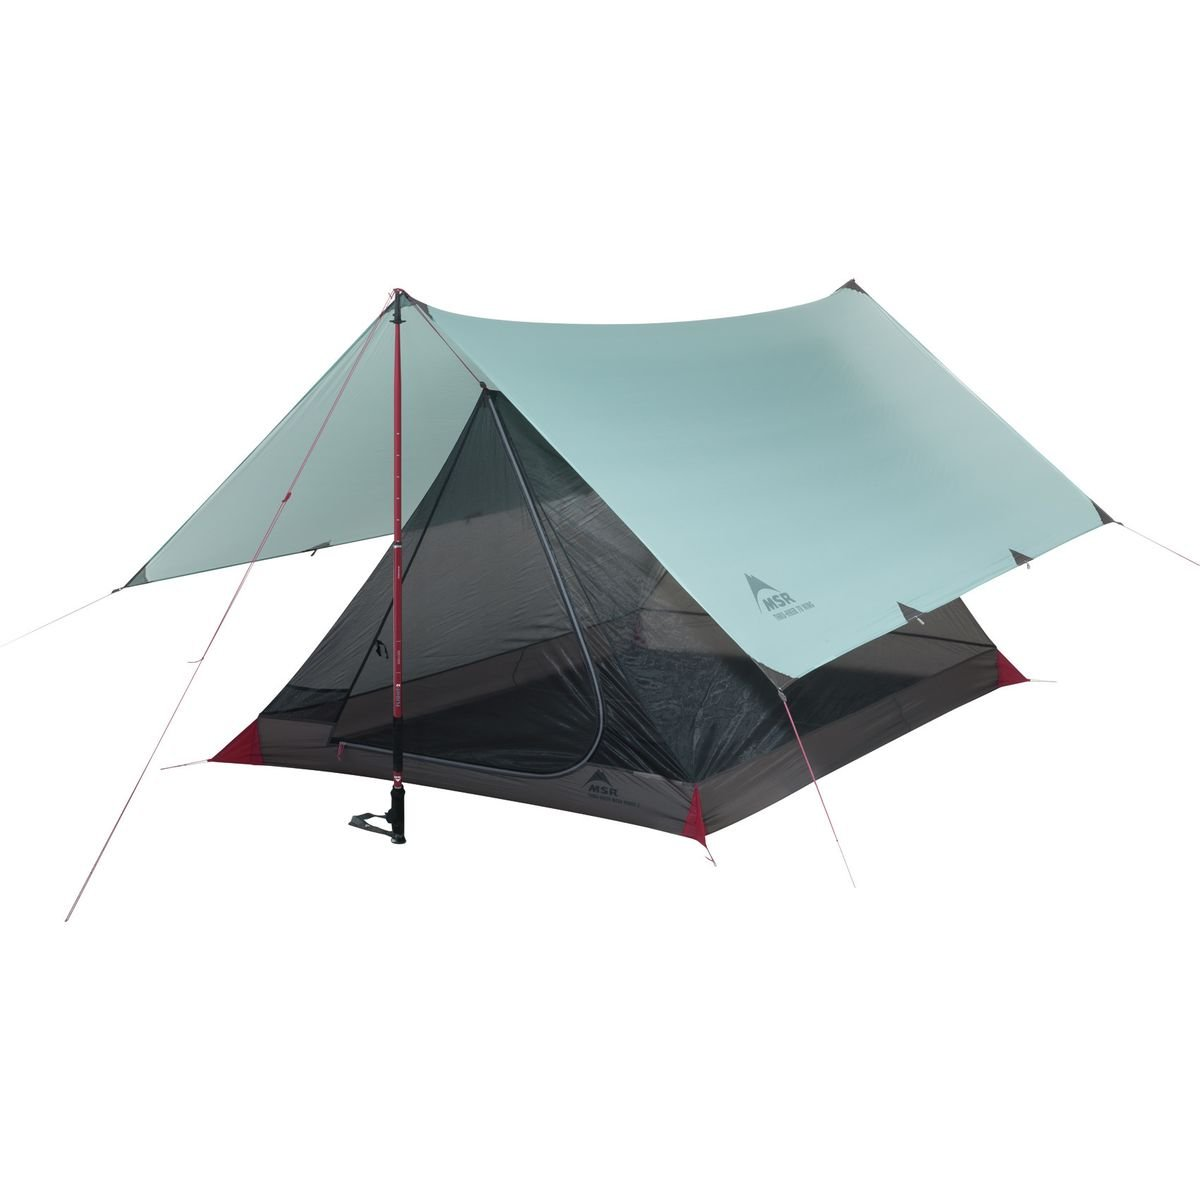 MSR Thru-Hiker Mesh House 2 Shelter Tent, Grey